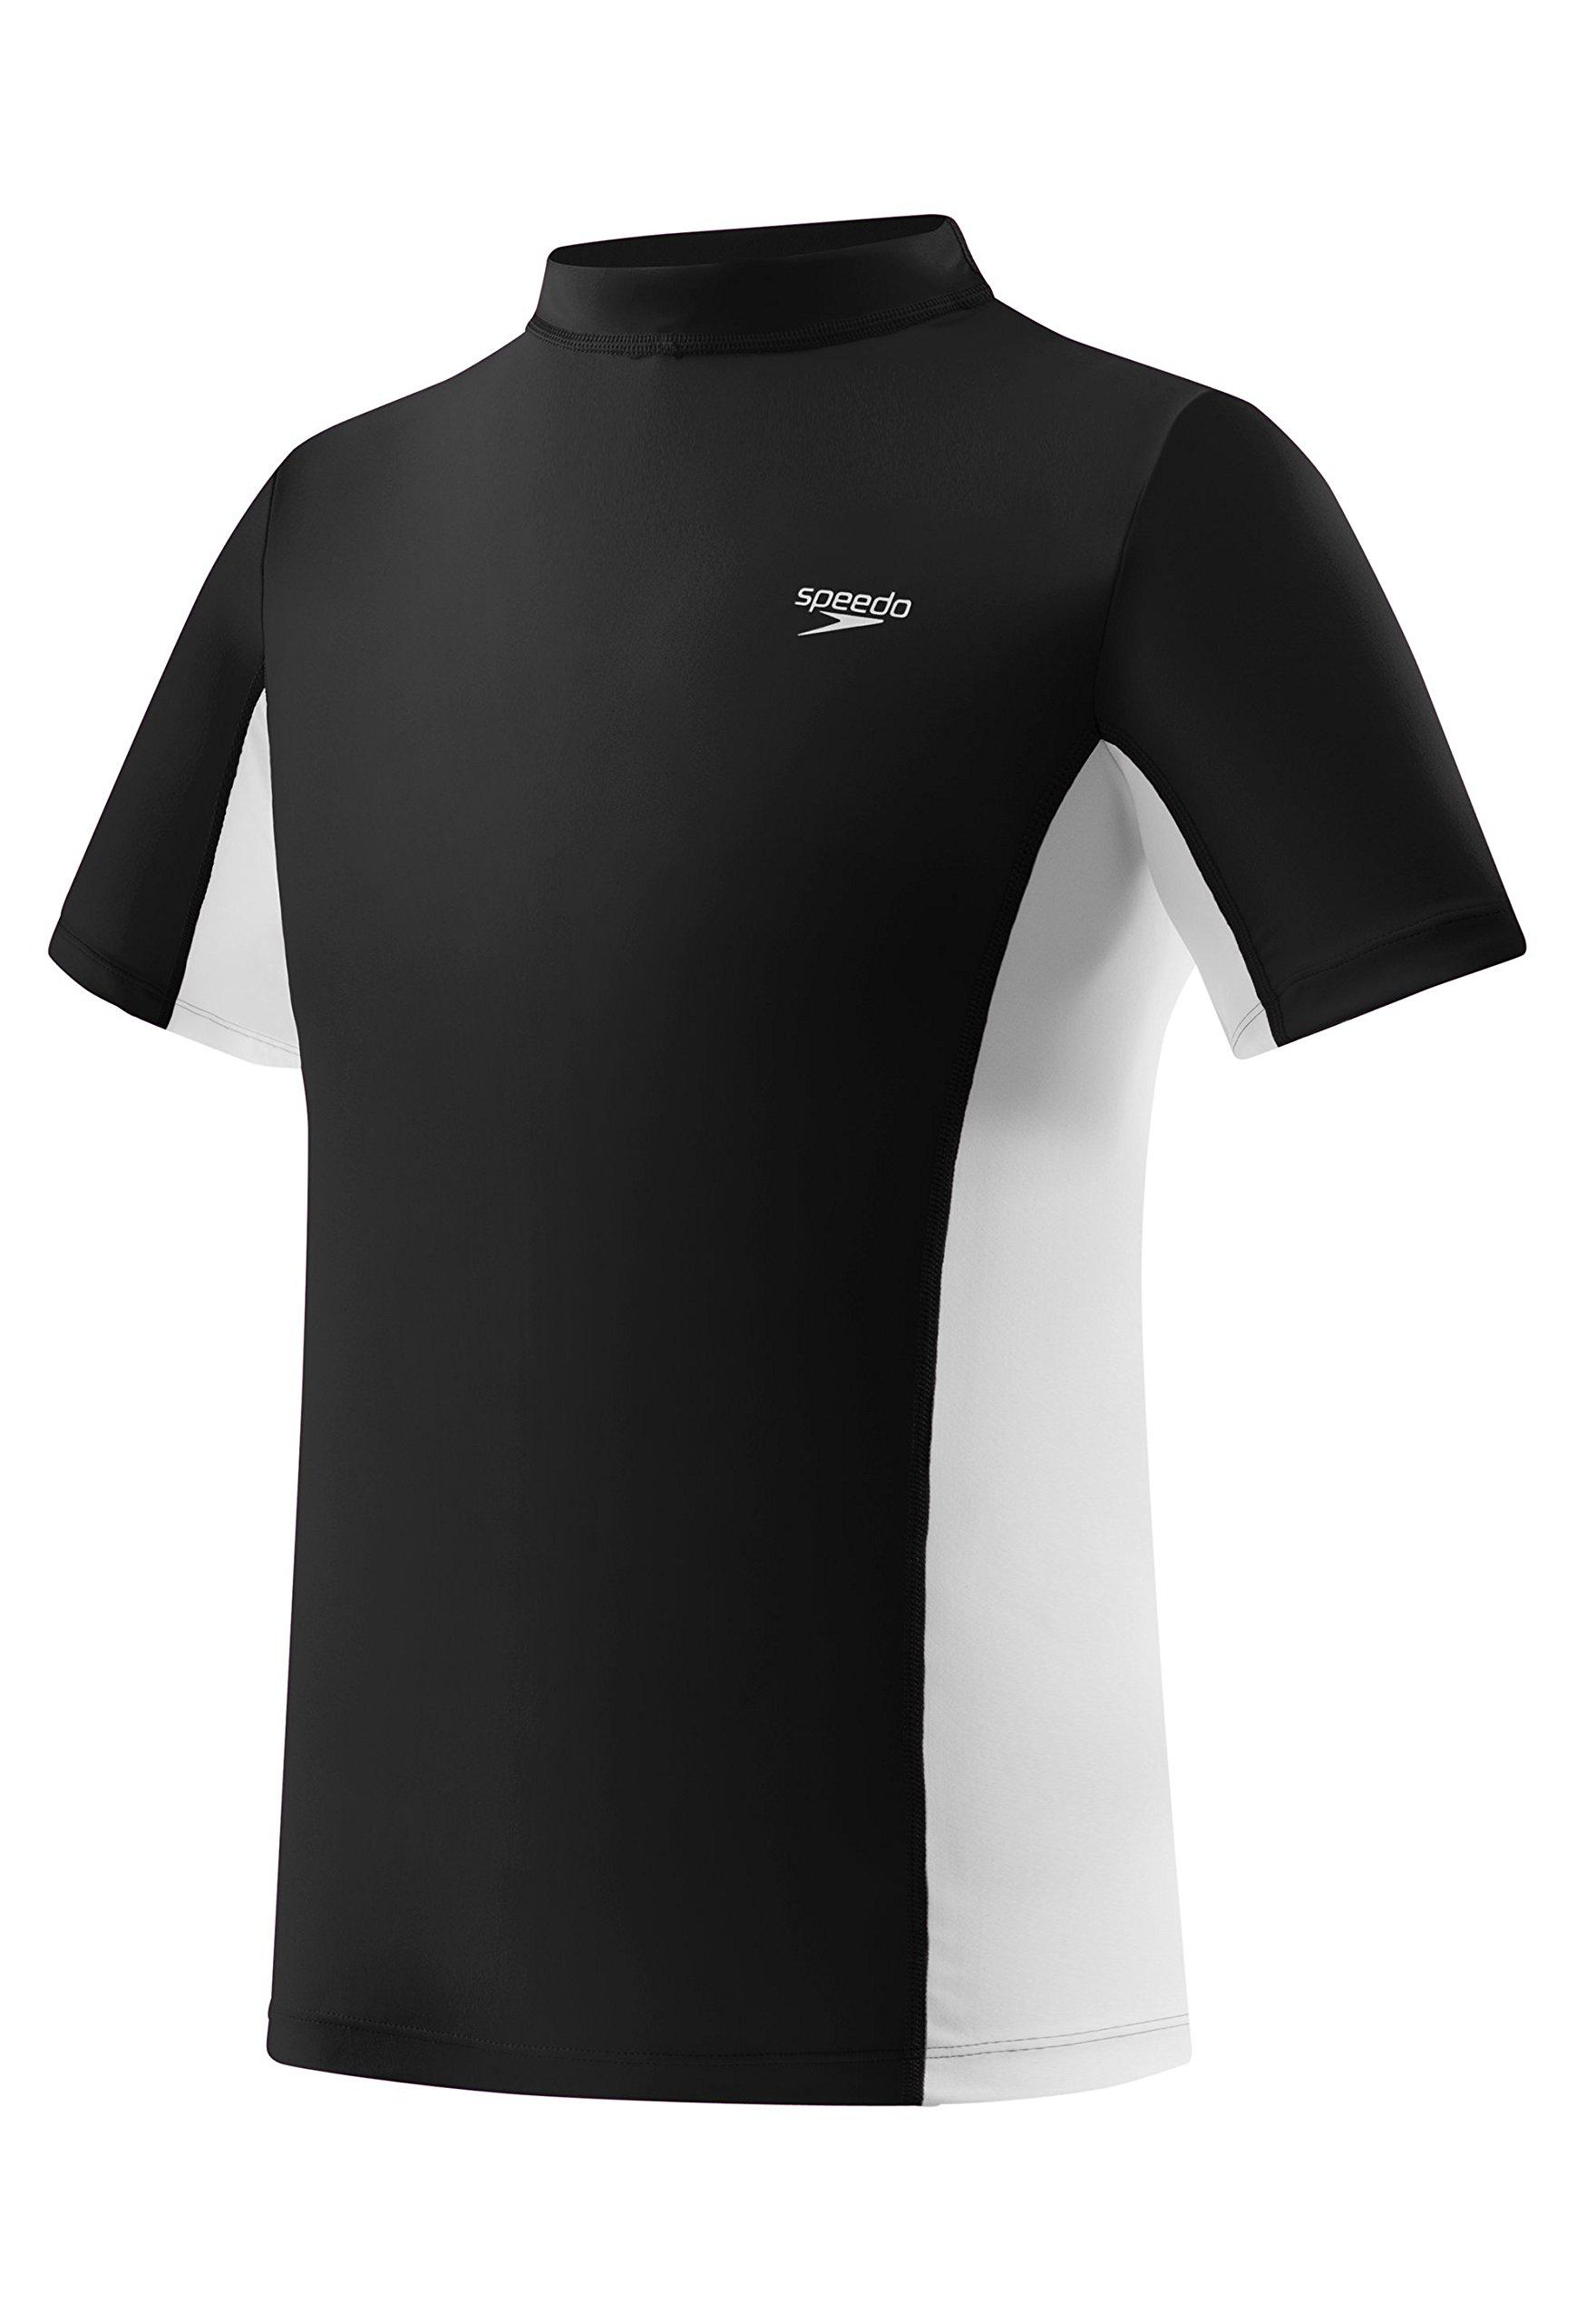 Speedo Big Boys' UV 50 Plus Short Sleeve Rashguard, Black, Small by Speedo